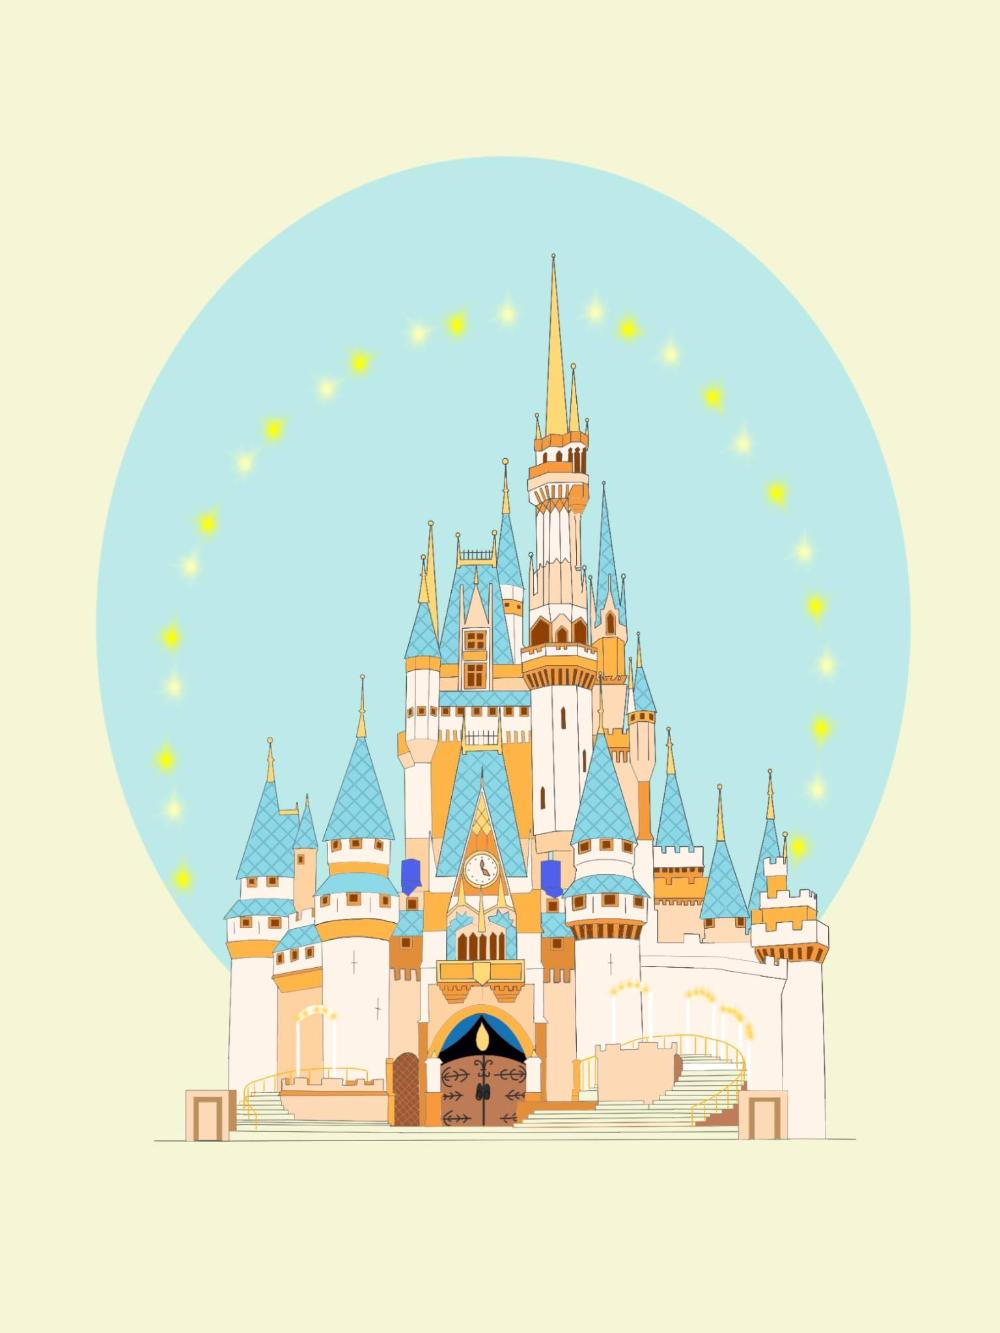 Magic Disney Png Pesquisa Google Magic Kingdom Disney World Florida Kingdom